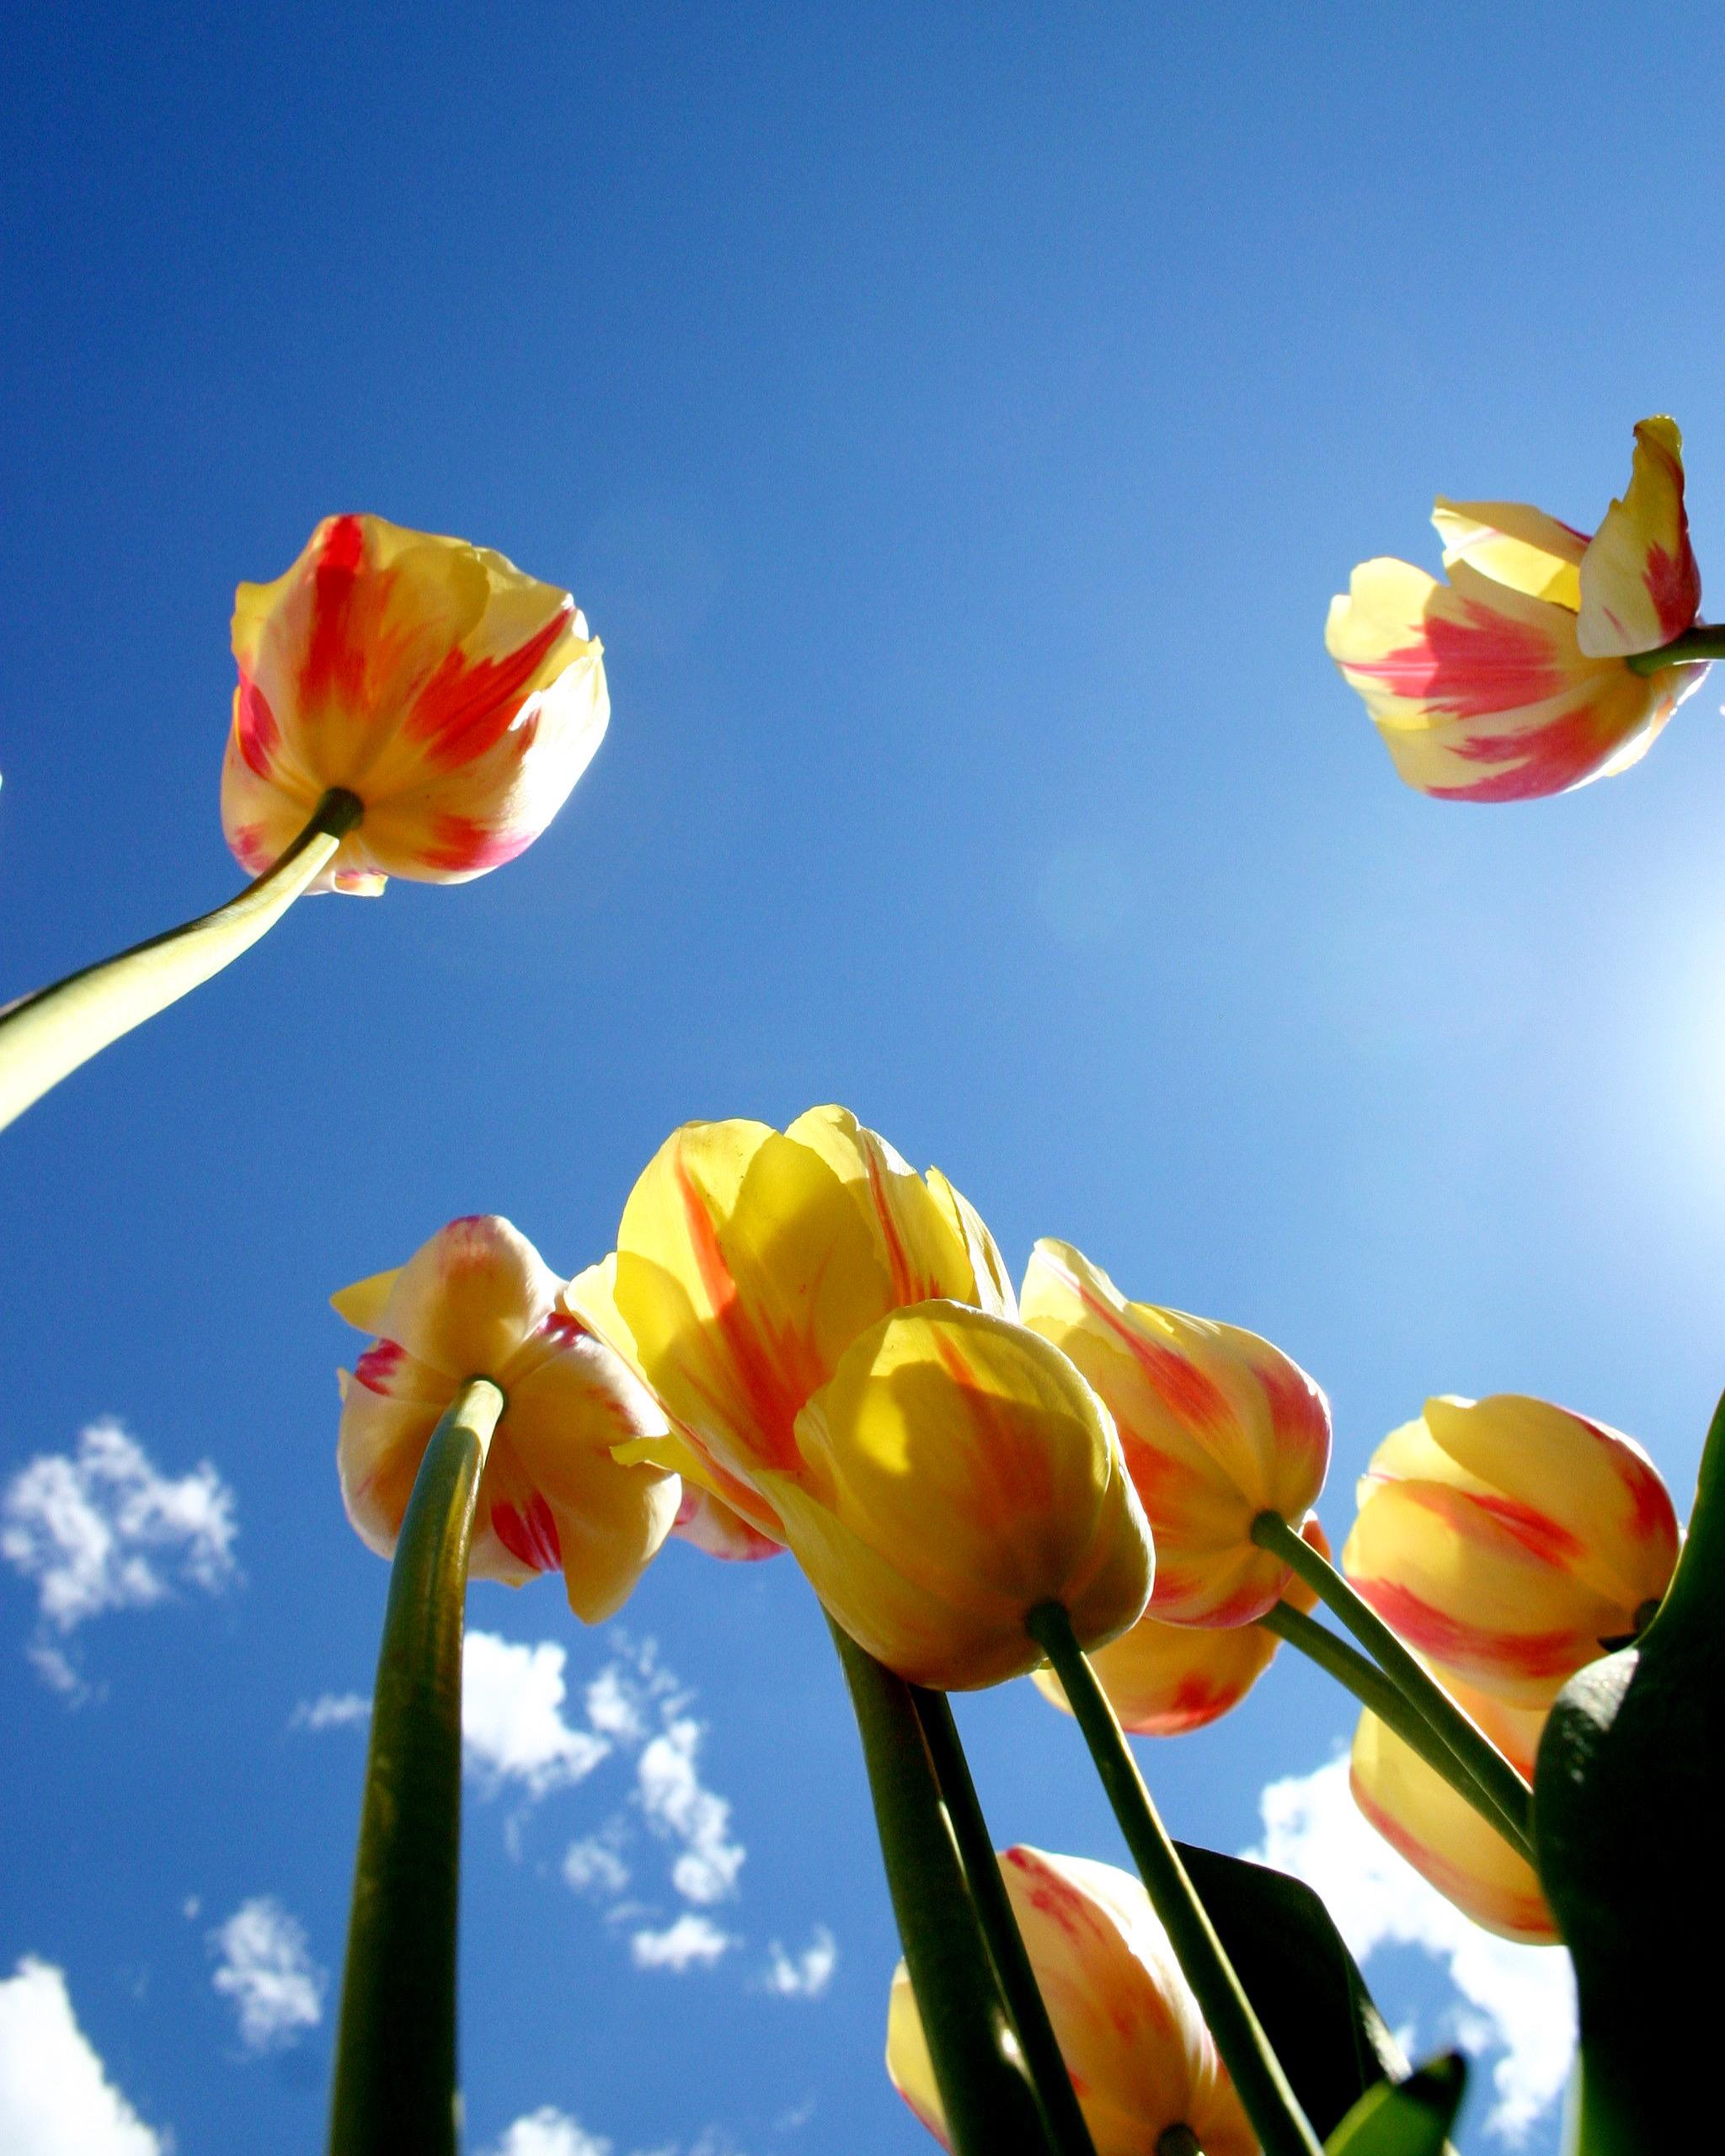 tulips shot from below